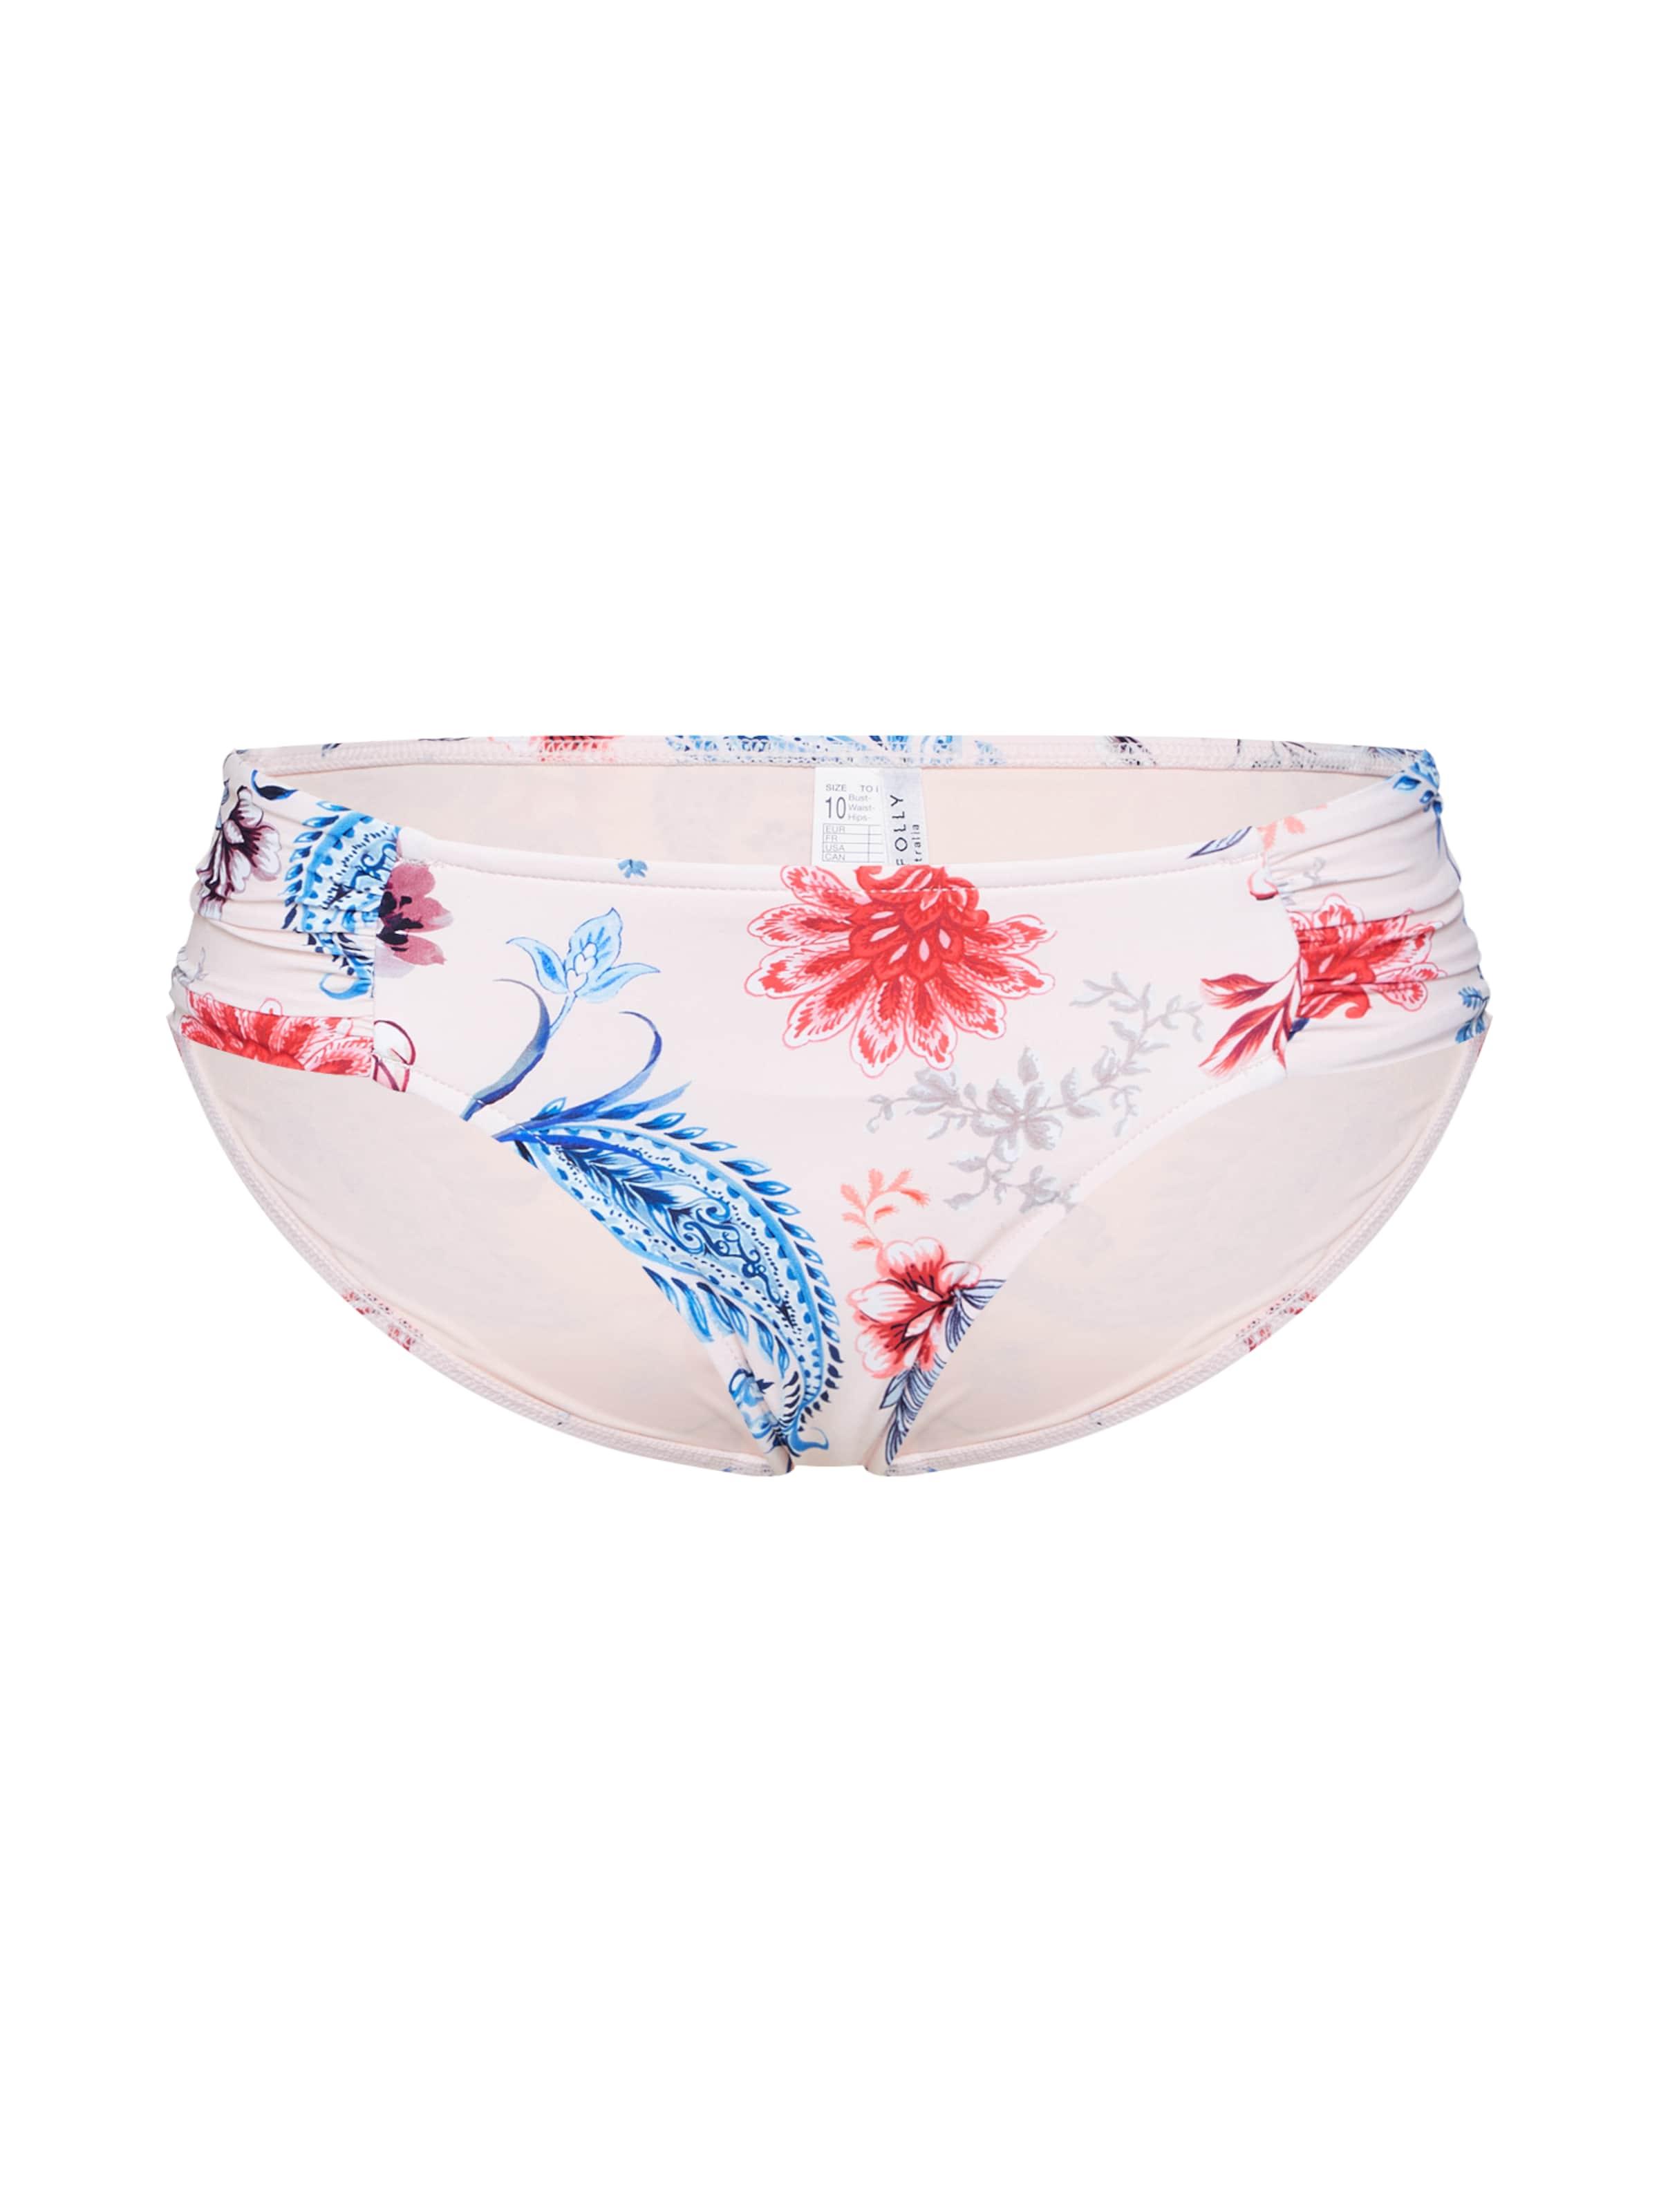 'ruched En Side De Mélange Seafolly Bikini Retro' CouleursRose Bas 5A3L4qScRj